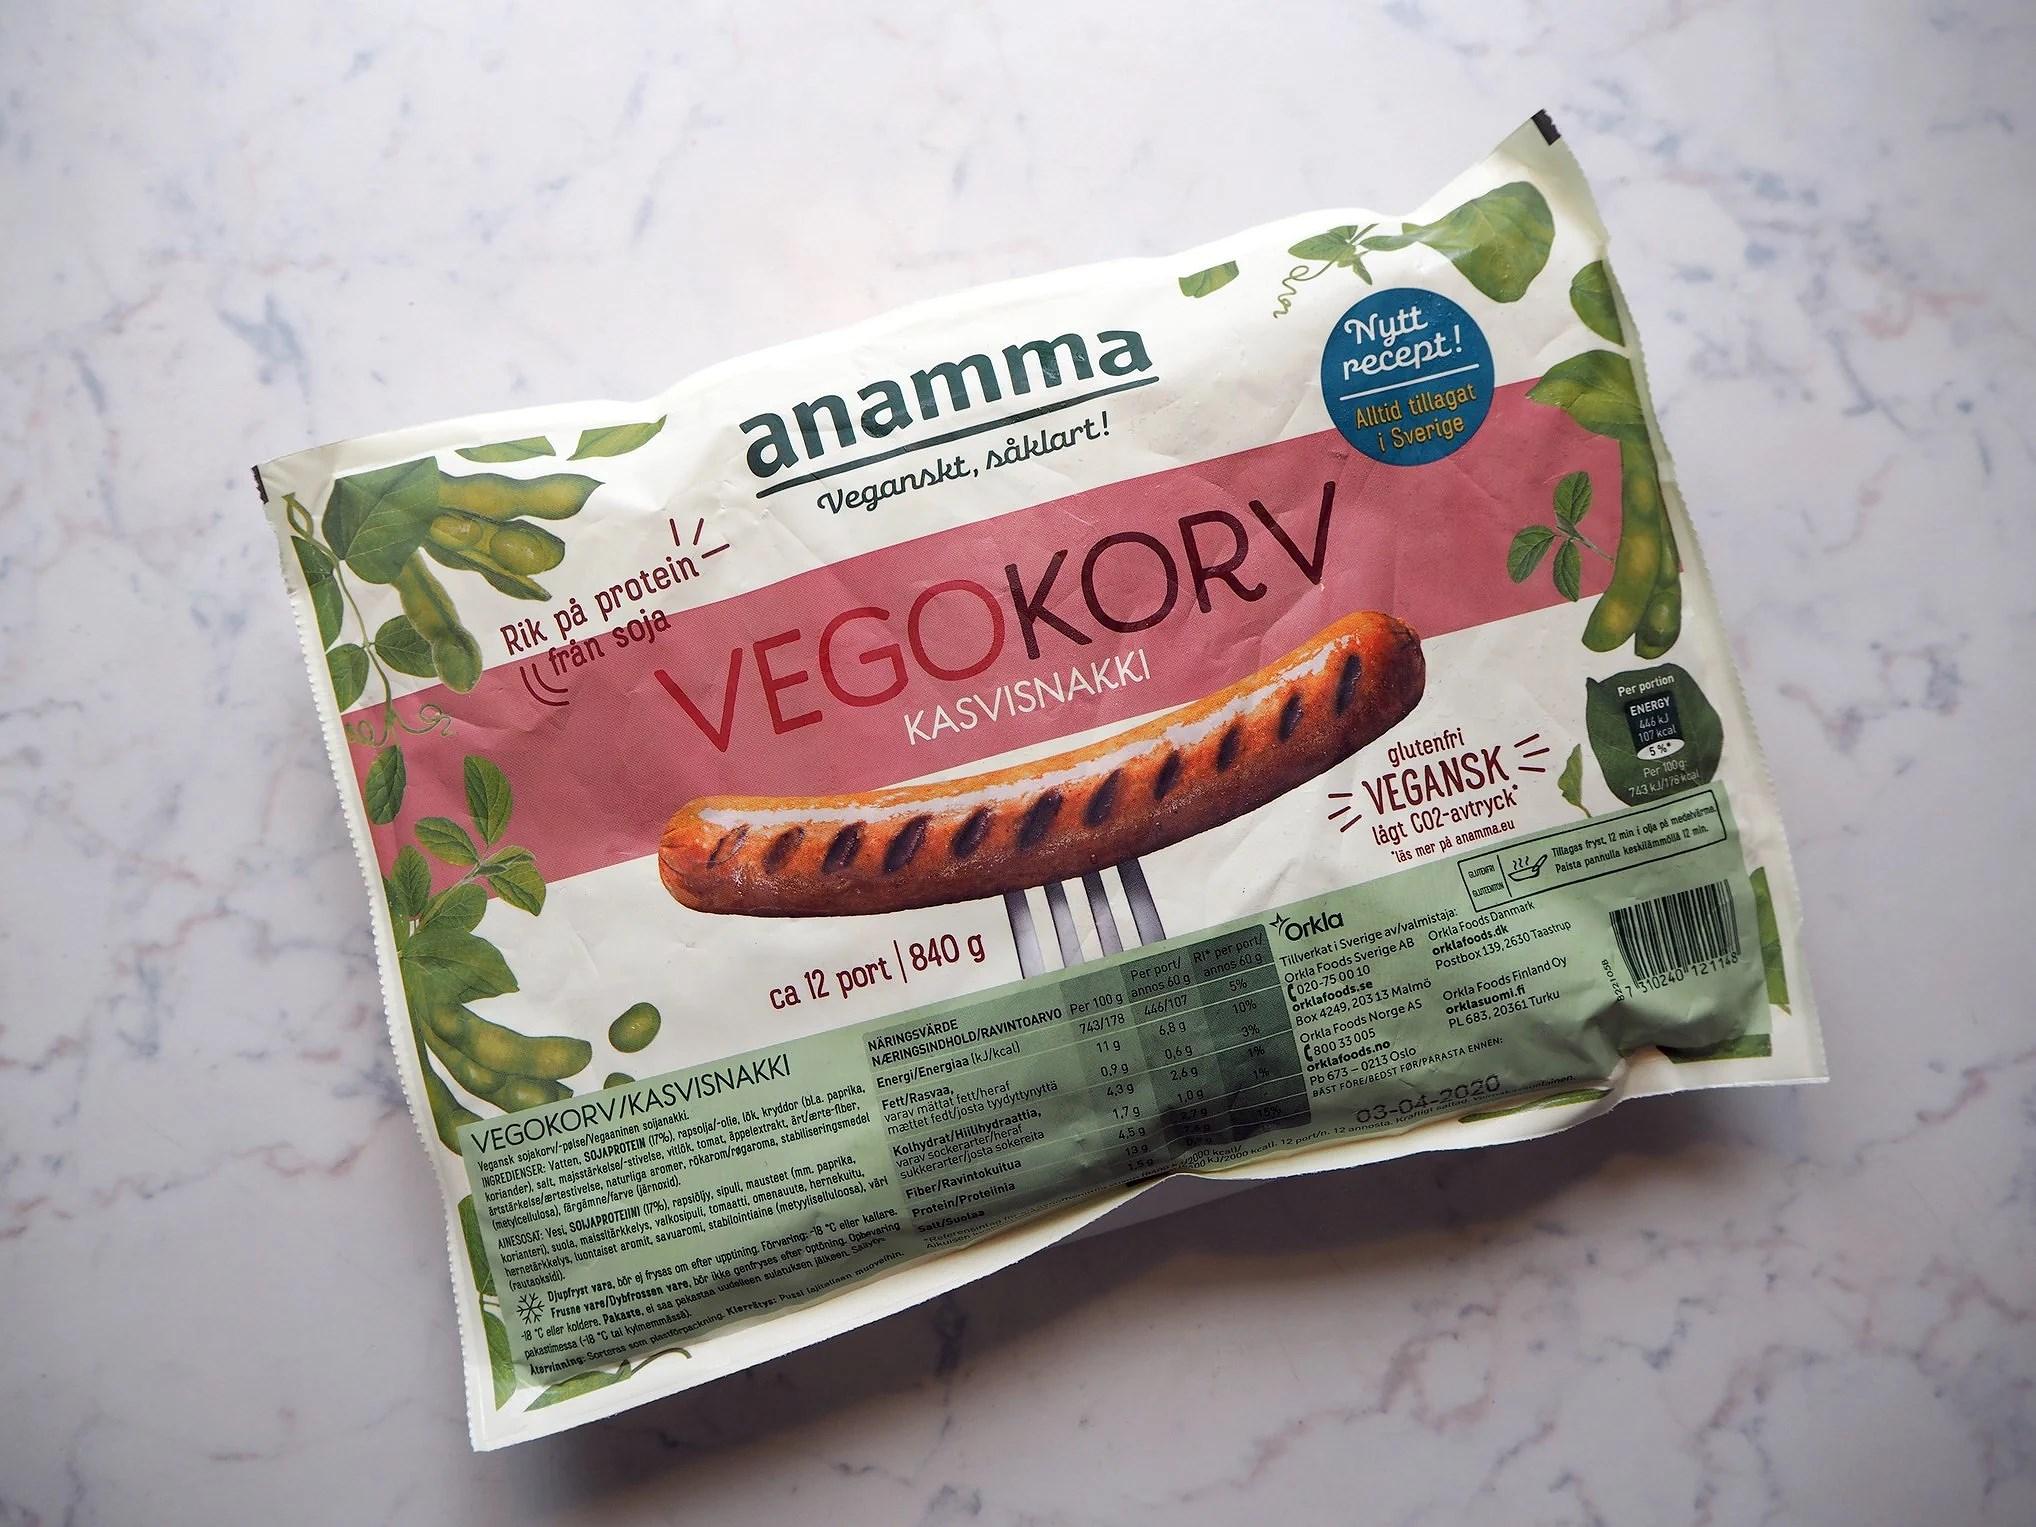 Malin testar - Vegan korv